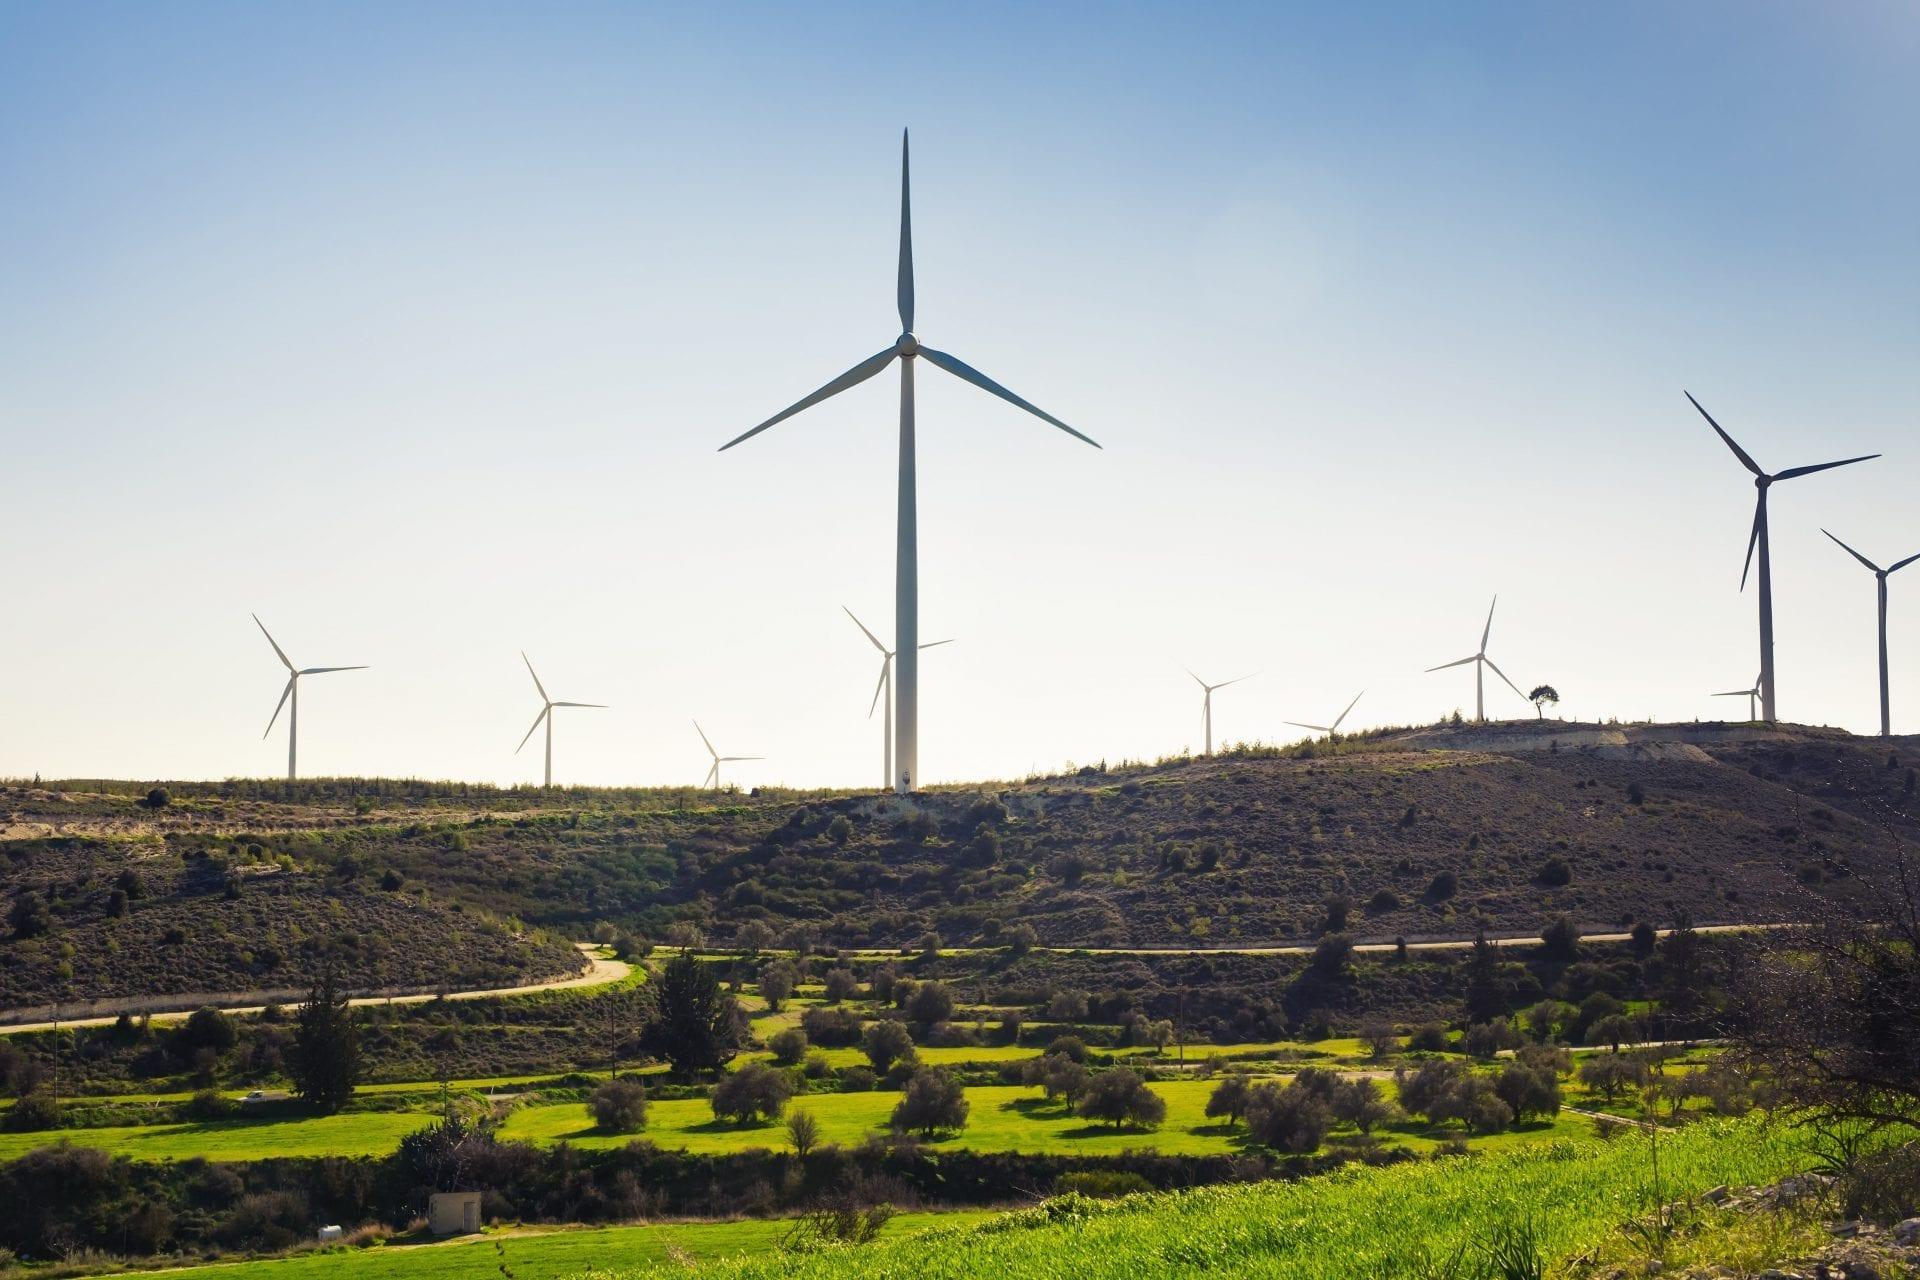 green-meadow-with-wind-turbines-generating-PS79W2B-min